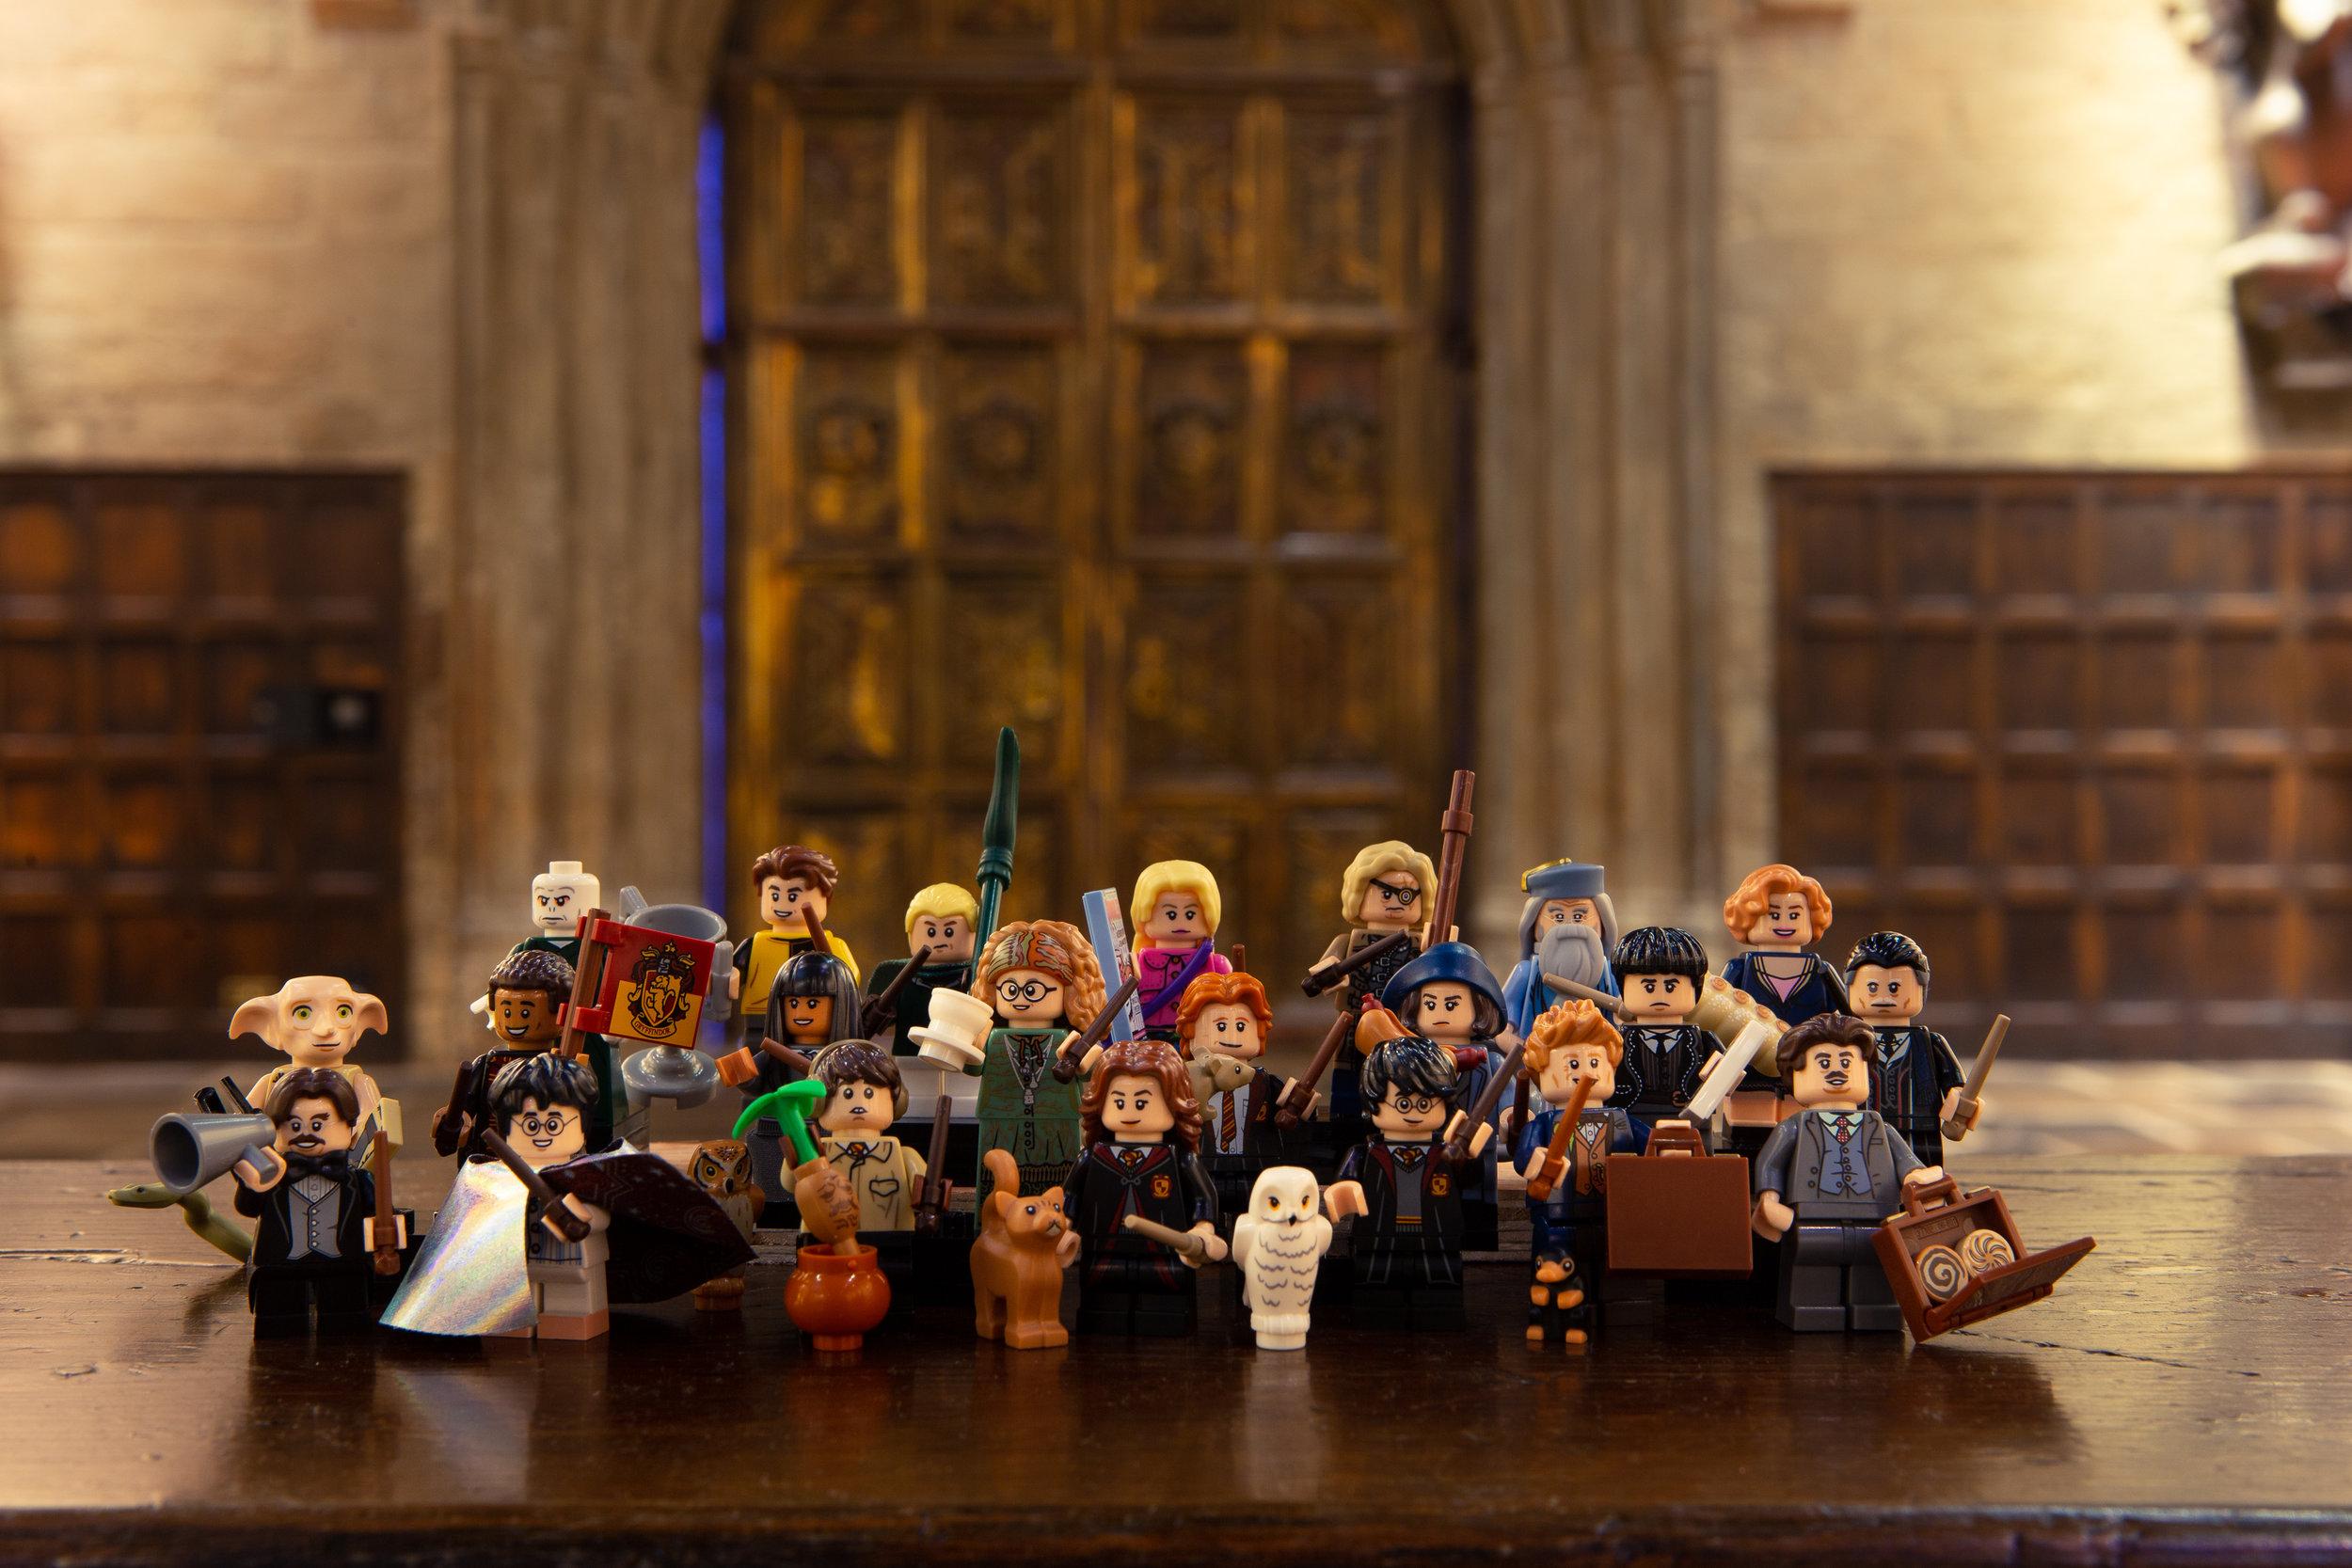 LEGO_WBST_19.06.18_hi-res-1.jpg